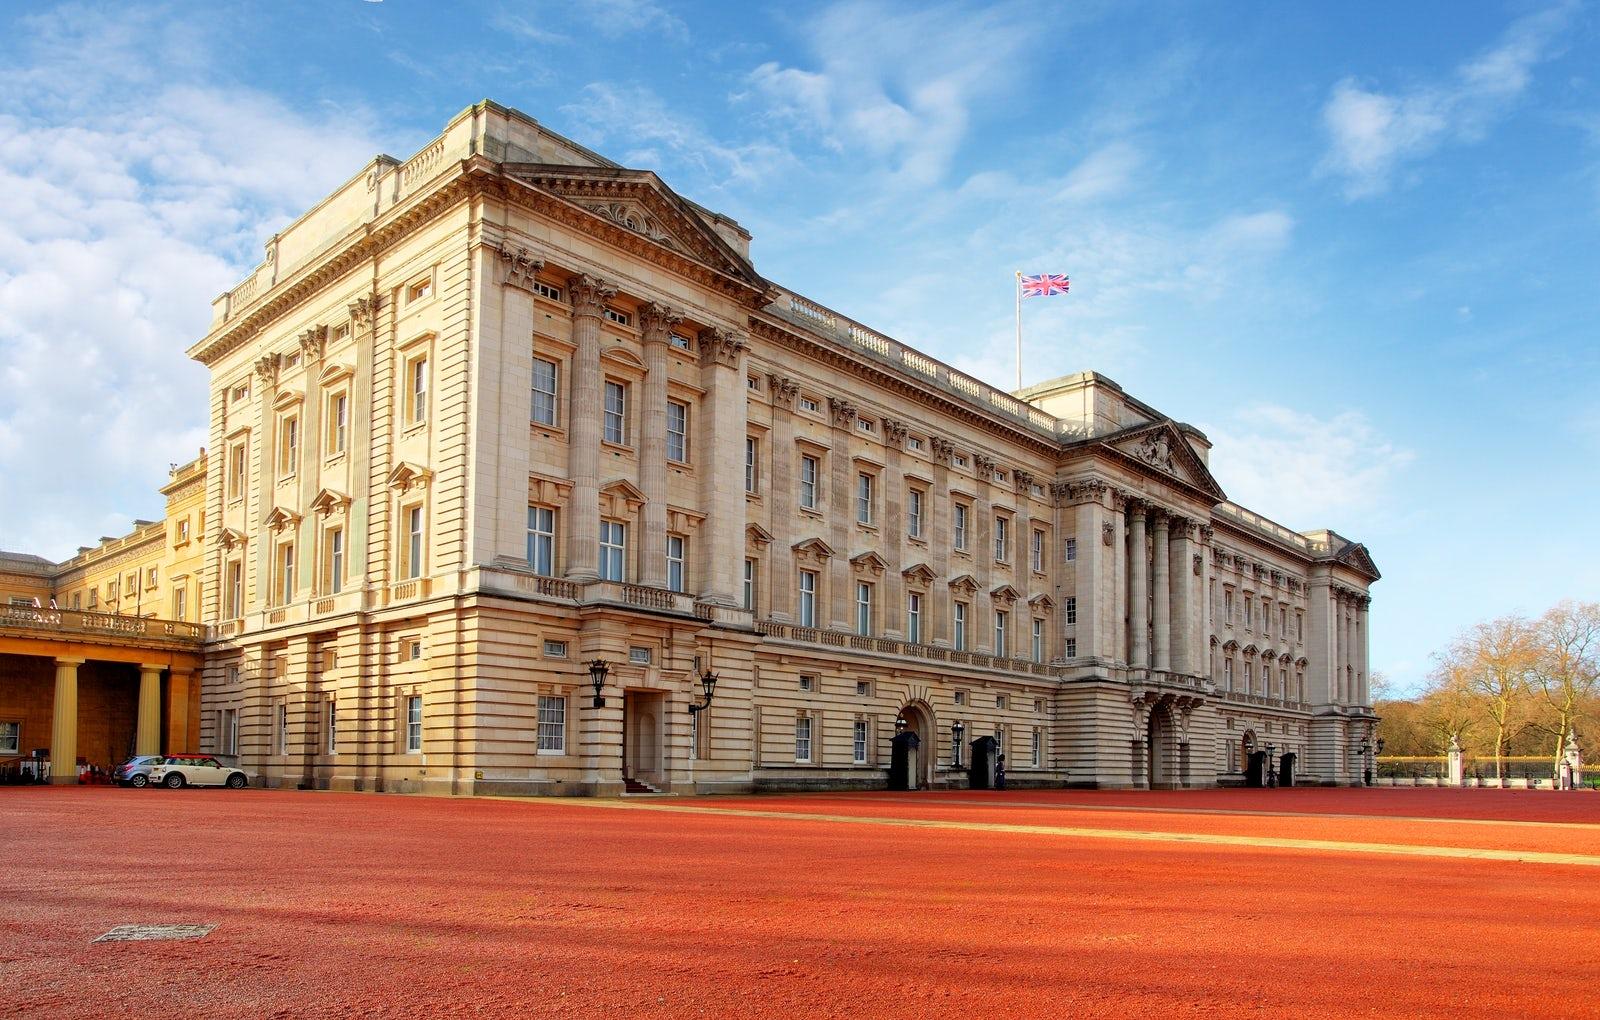 Premium Tour Of Windsor Castle And Buckingham Palace